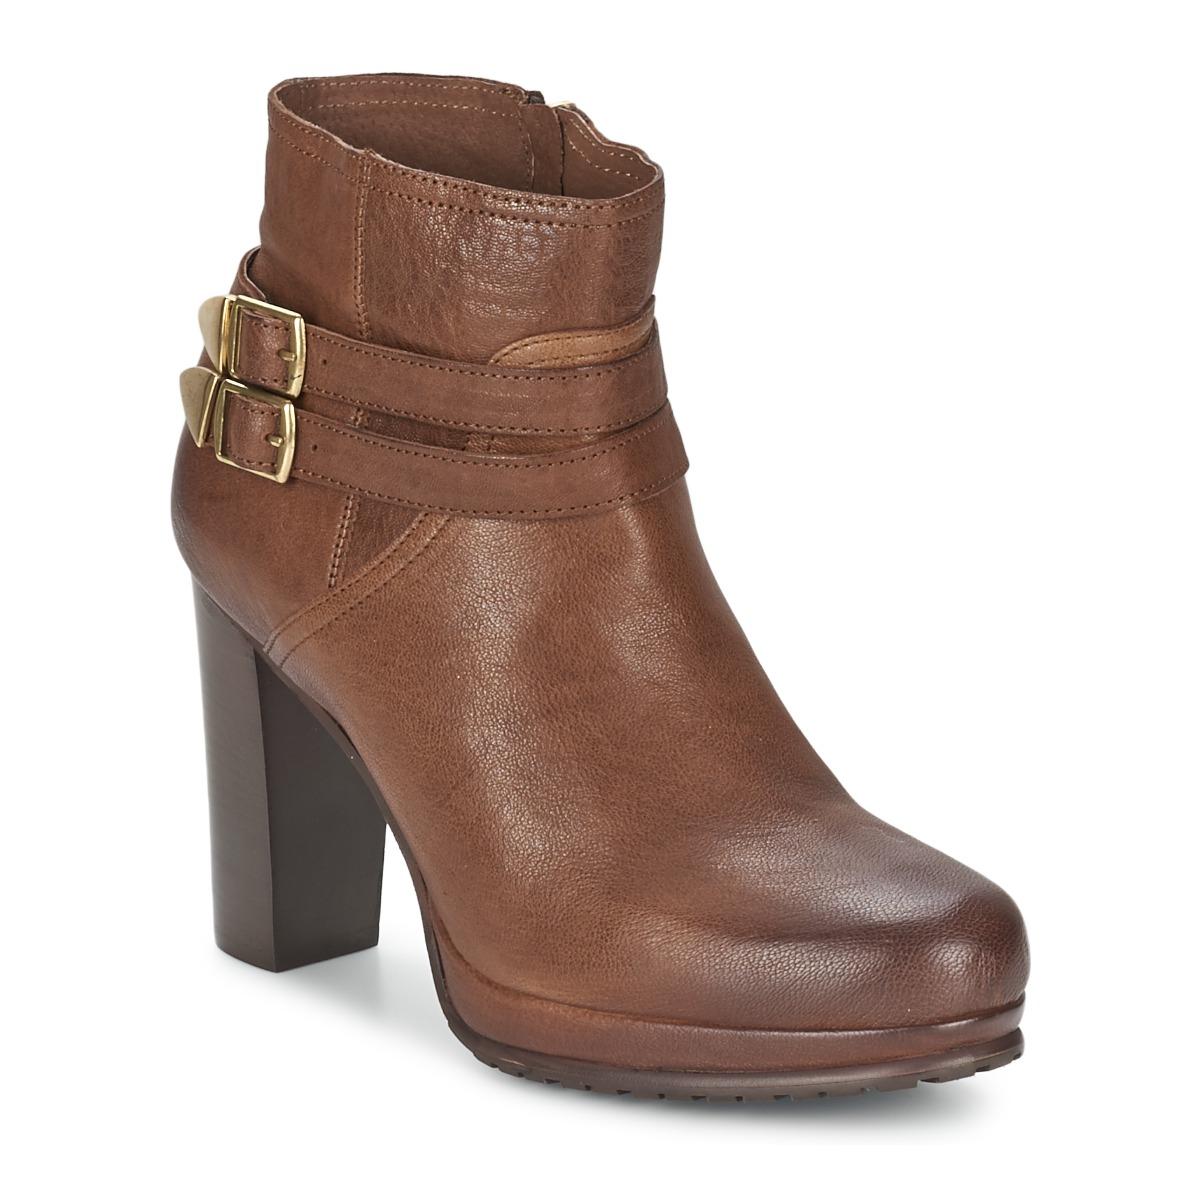 Koah BONNIE Cognac - Kostenloser Versand bei Spartoode ! - Schuhe Ankle Boots Damen 79,60 €